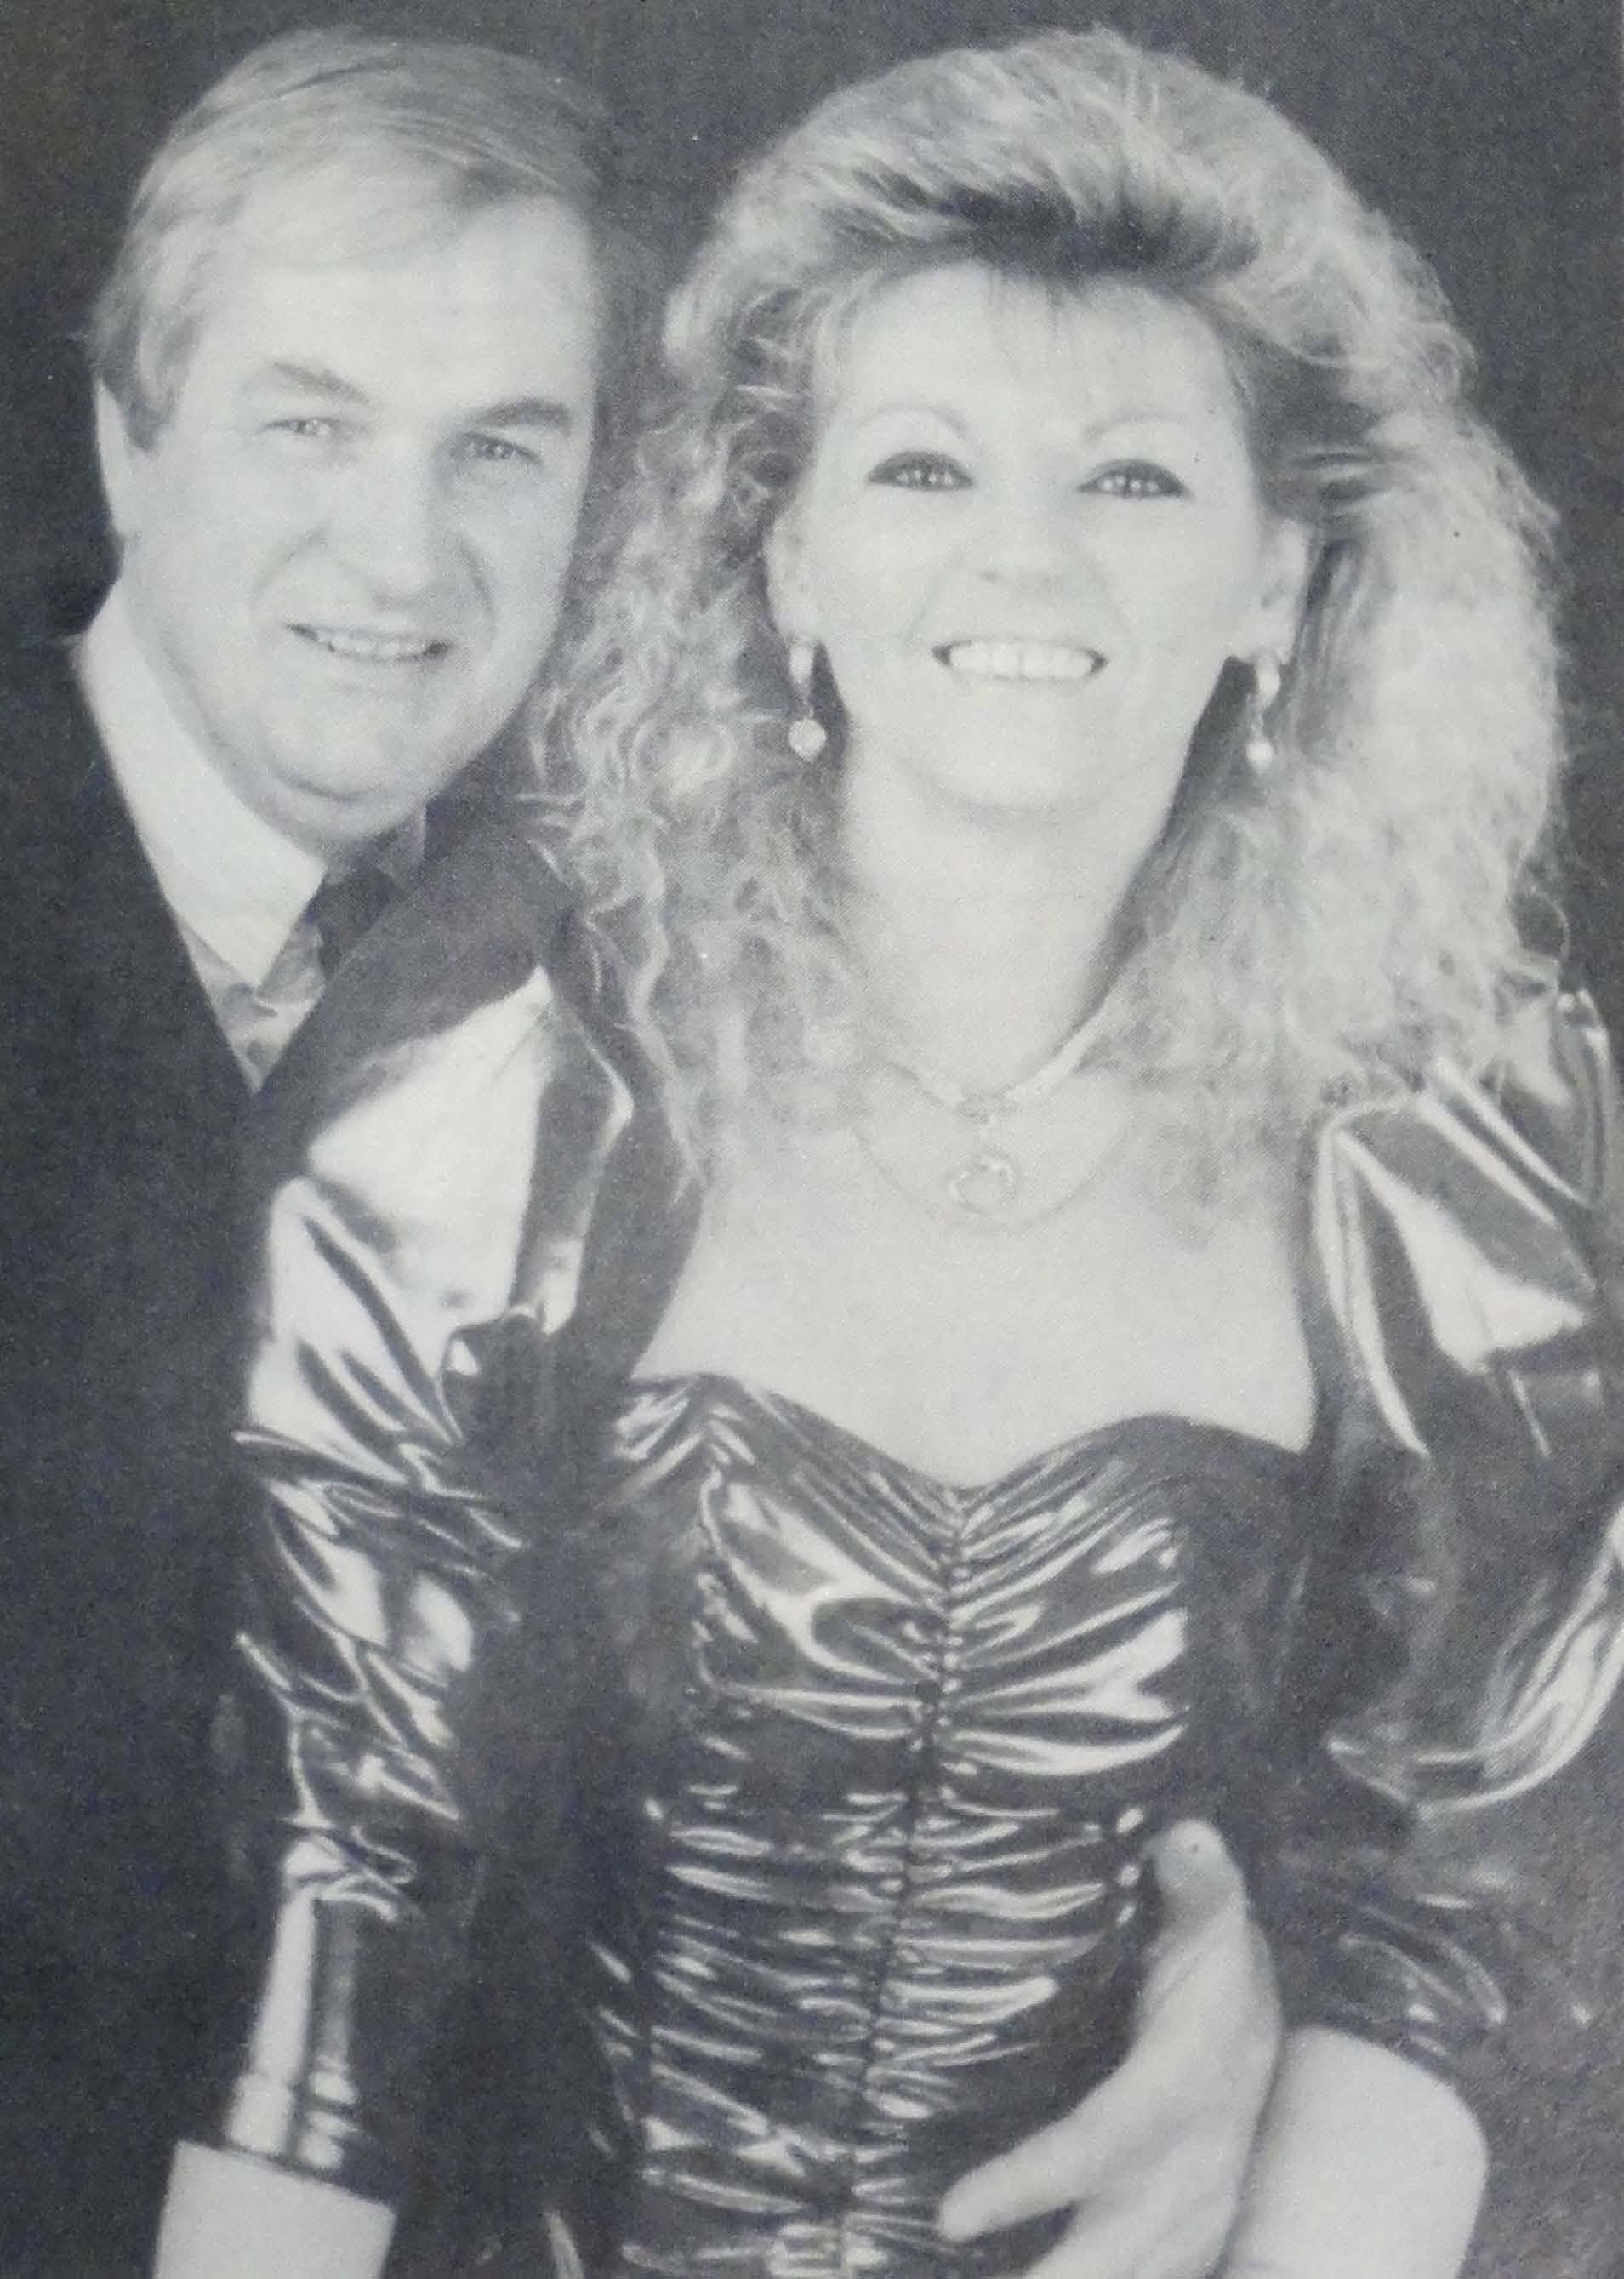 Bernd I. & Erika II., Saison 1989